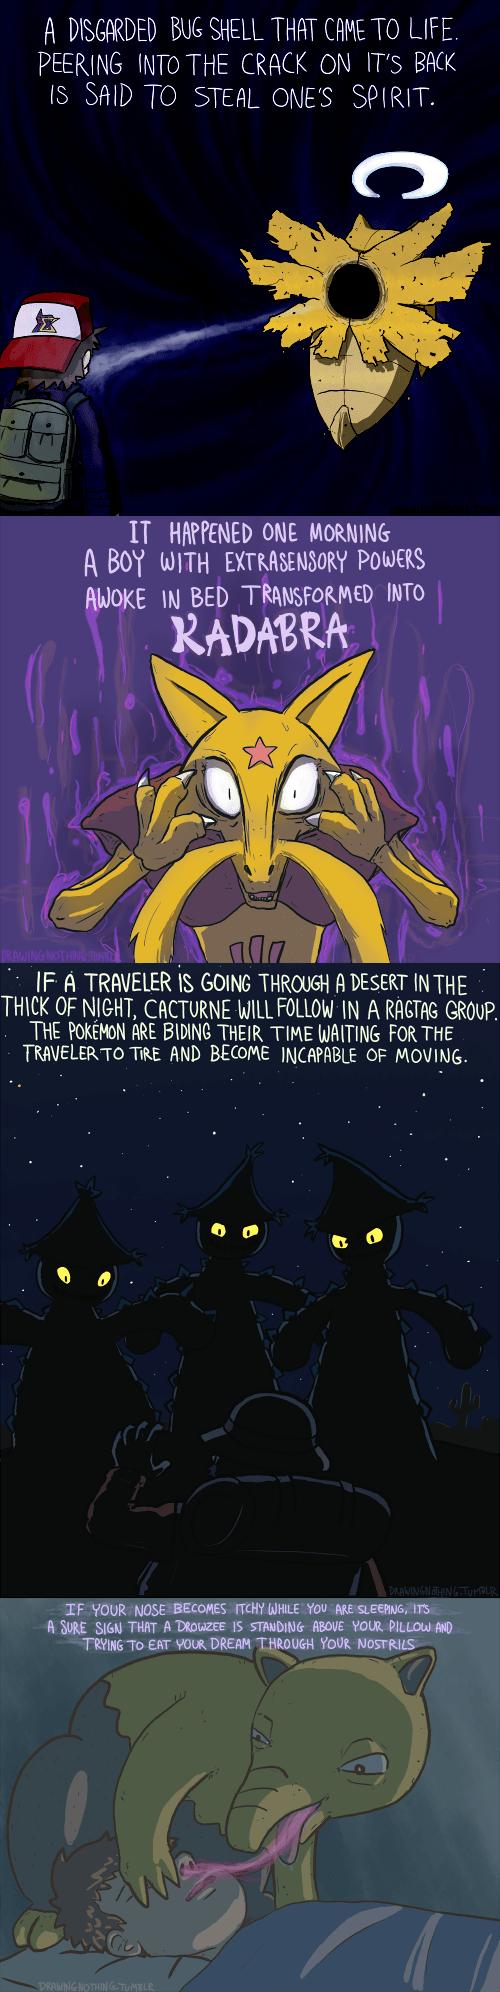 pokedex creepy im scared Pokémon - 6684528128